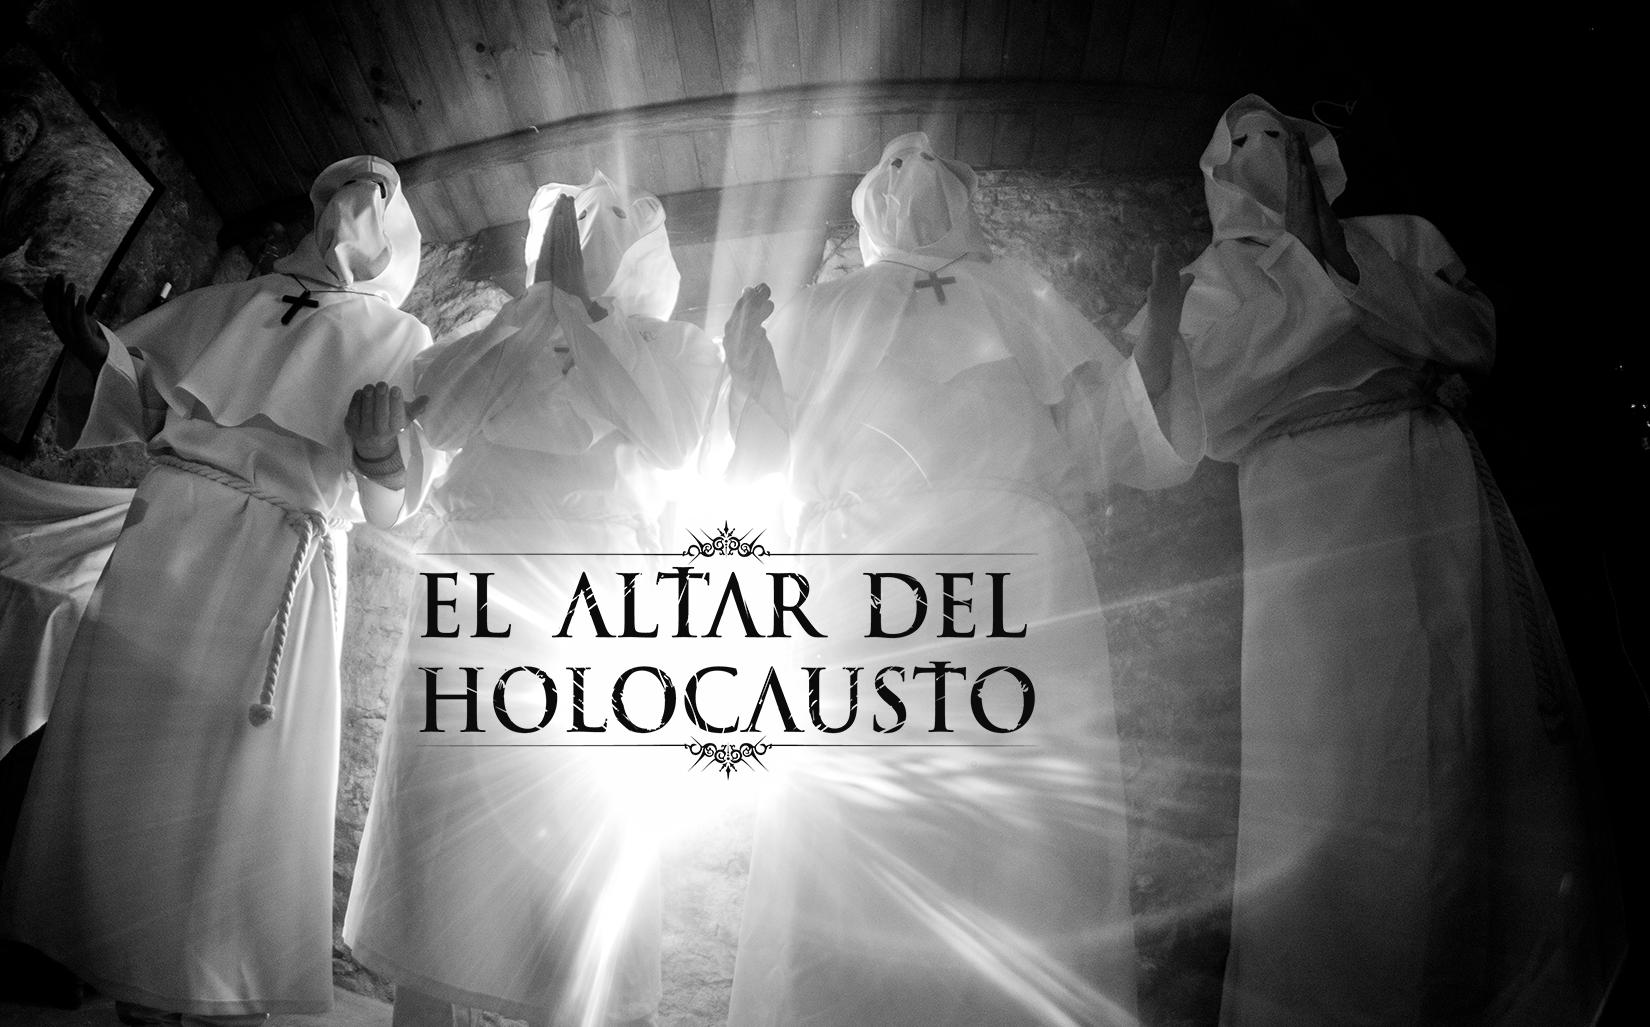 ENTREVISTA A EL ALTAR DEL HOLOCAUSTO